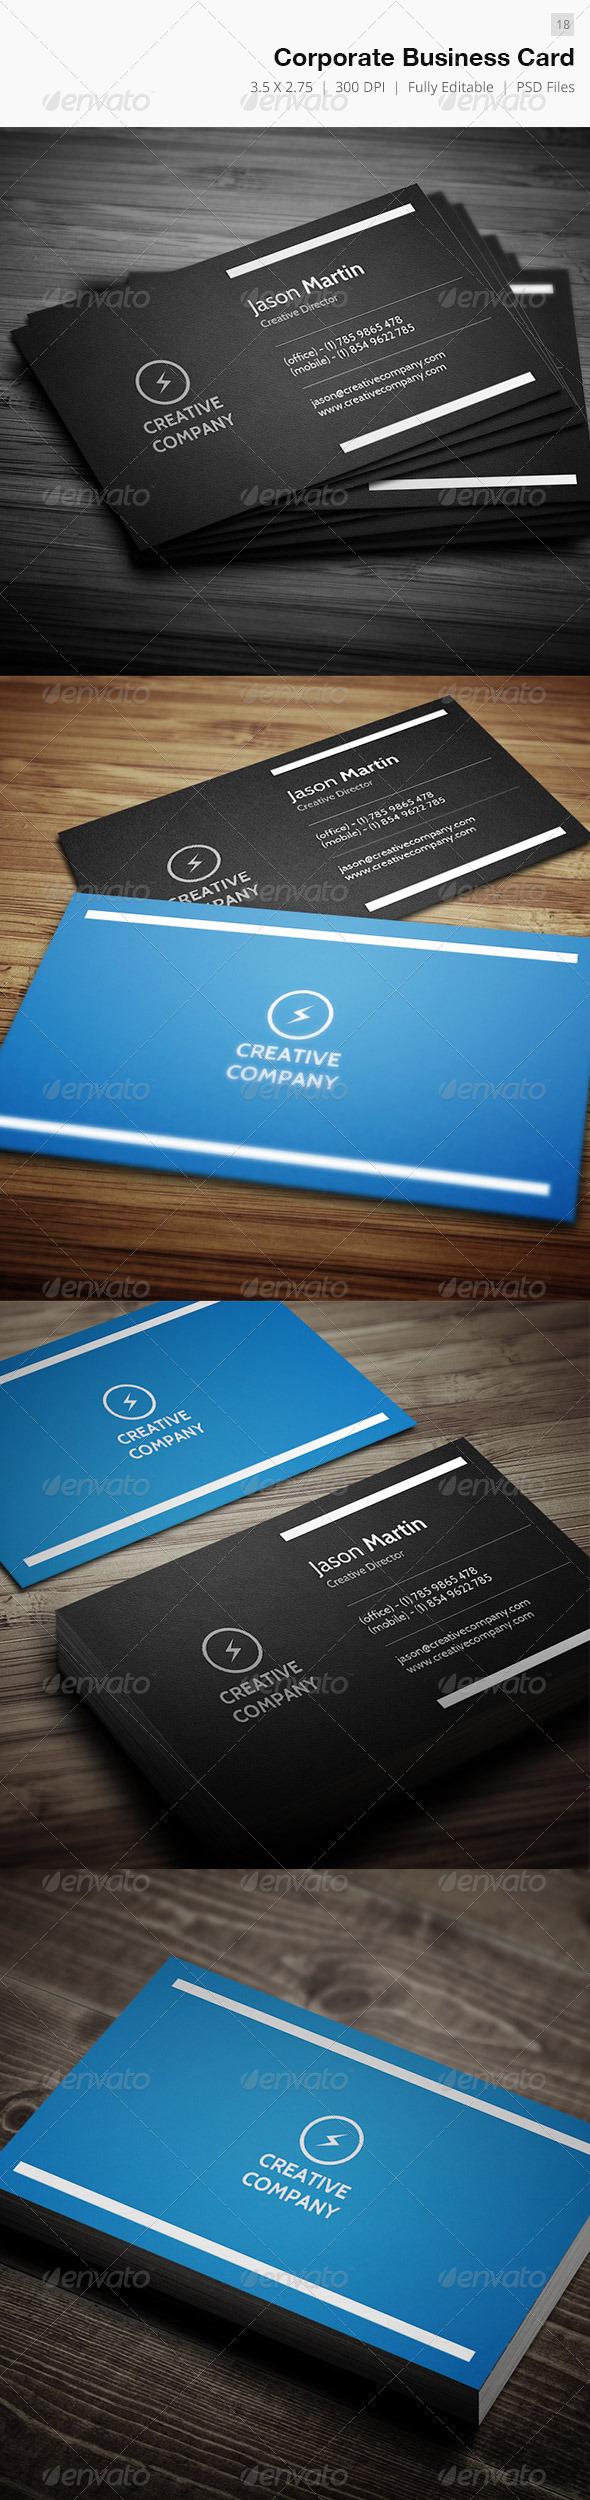 Minimal Corporate Business Card - 18 - Corporate Business Cards